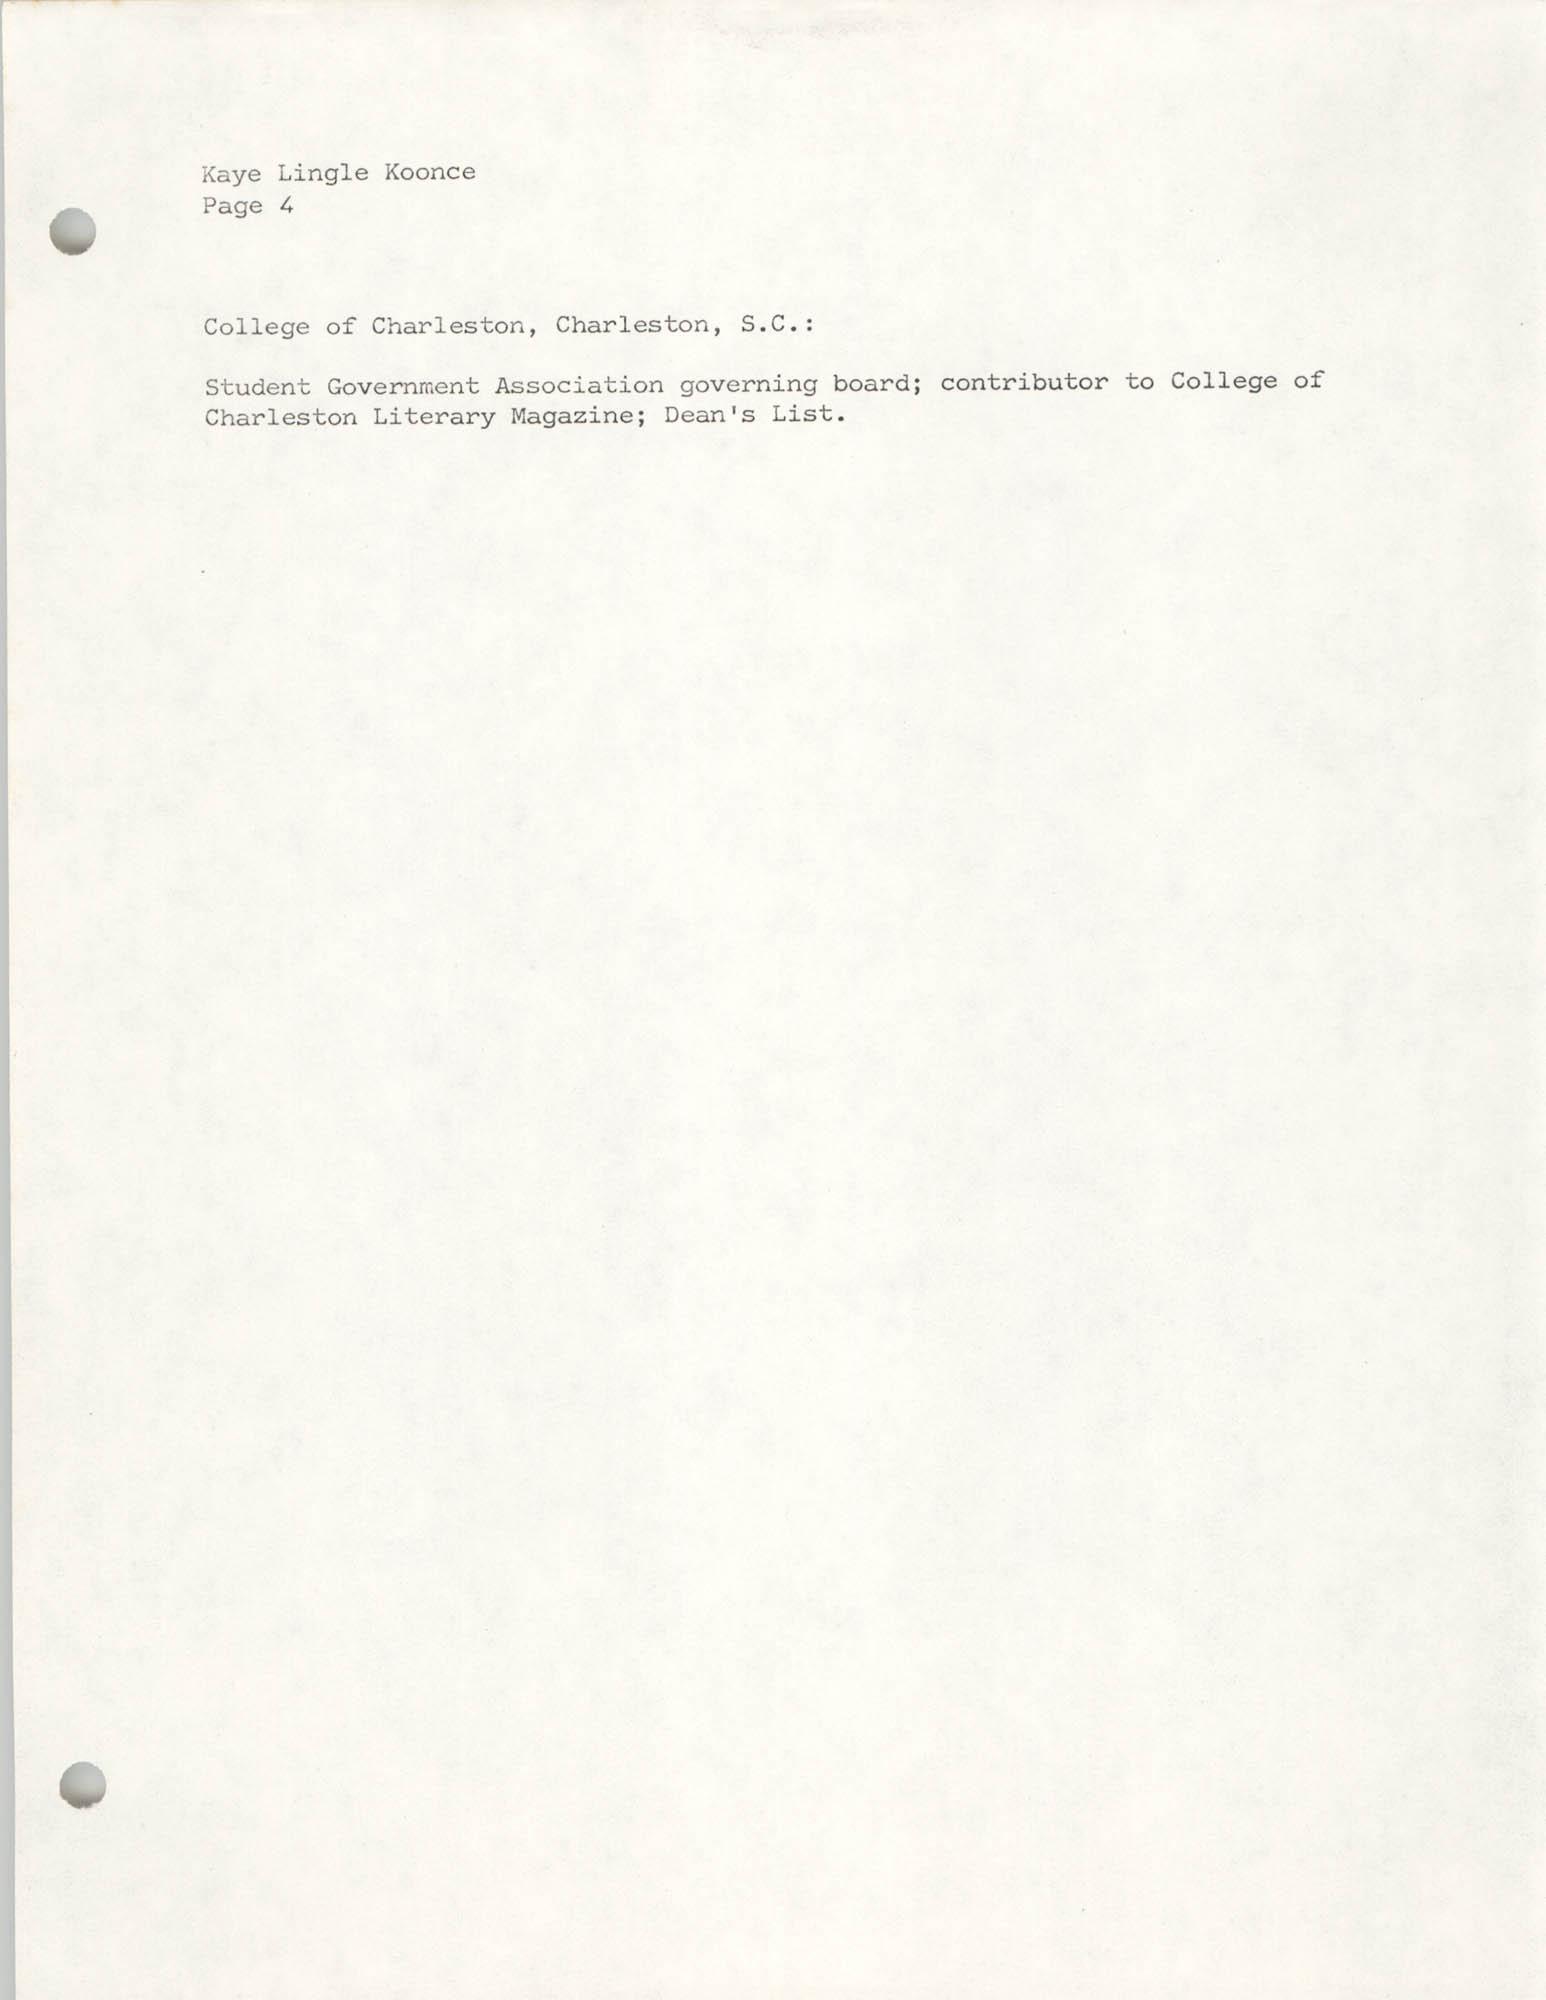 COBRA Consultant Resumes, Kaye Lingle Koonce, Page 4